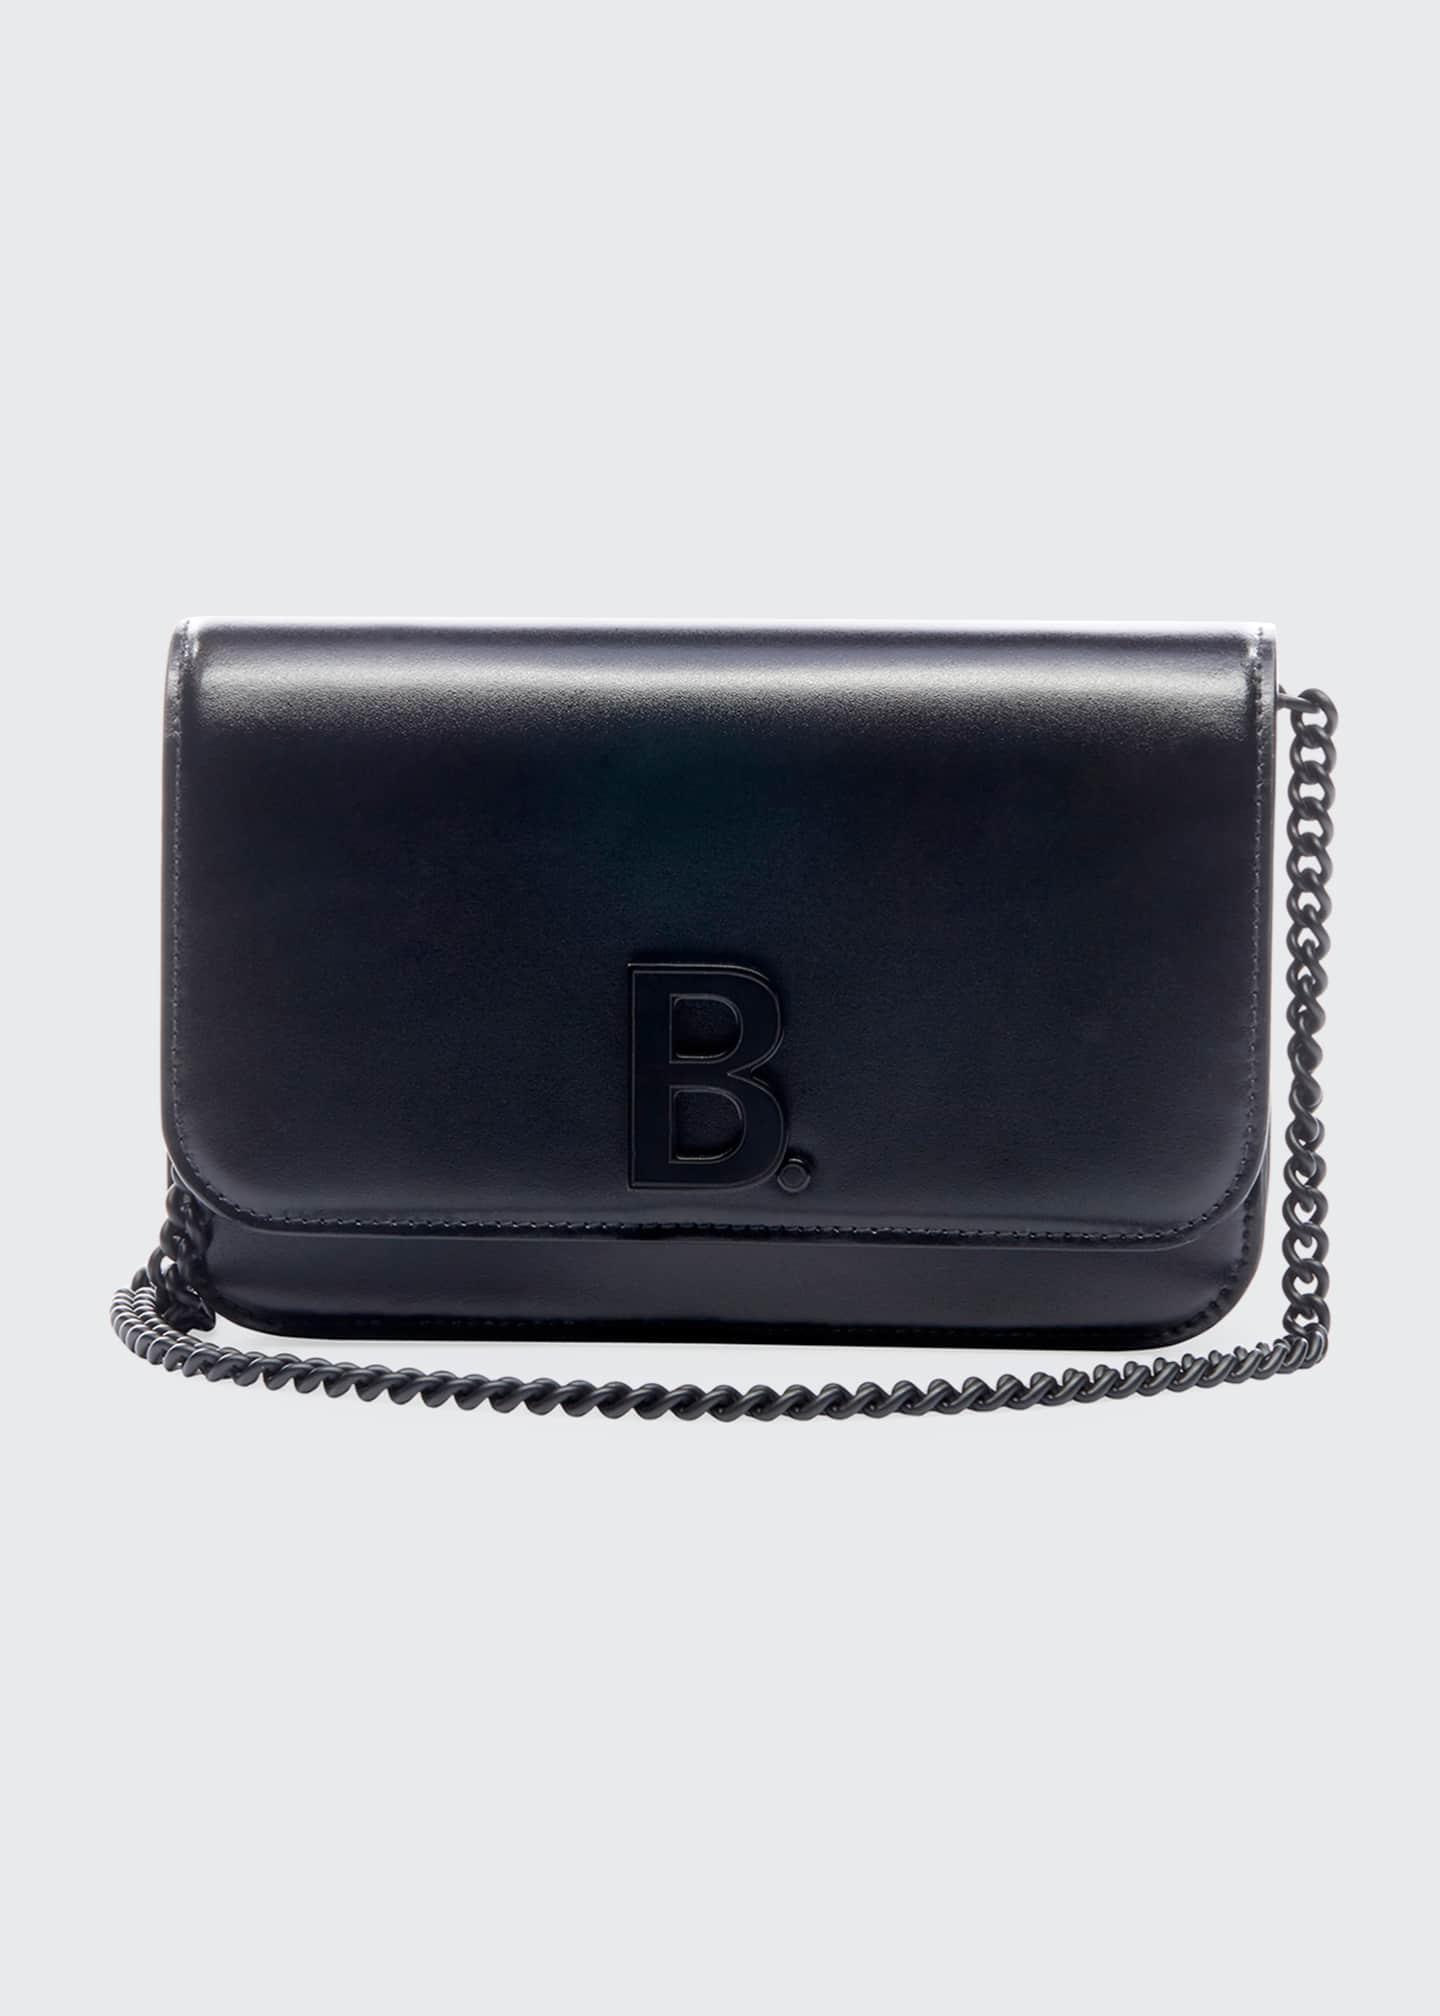 Balenciaga B Continent Chain Shiny Box Wallet